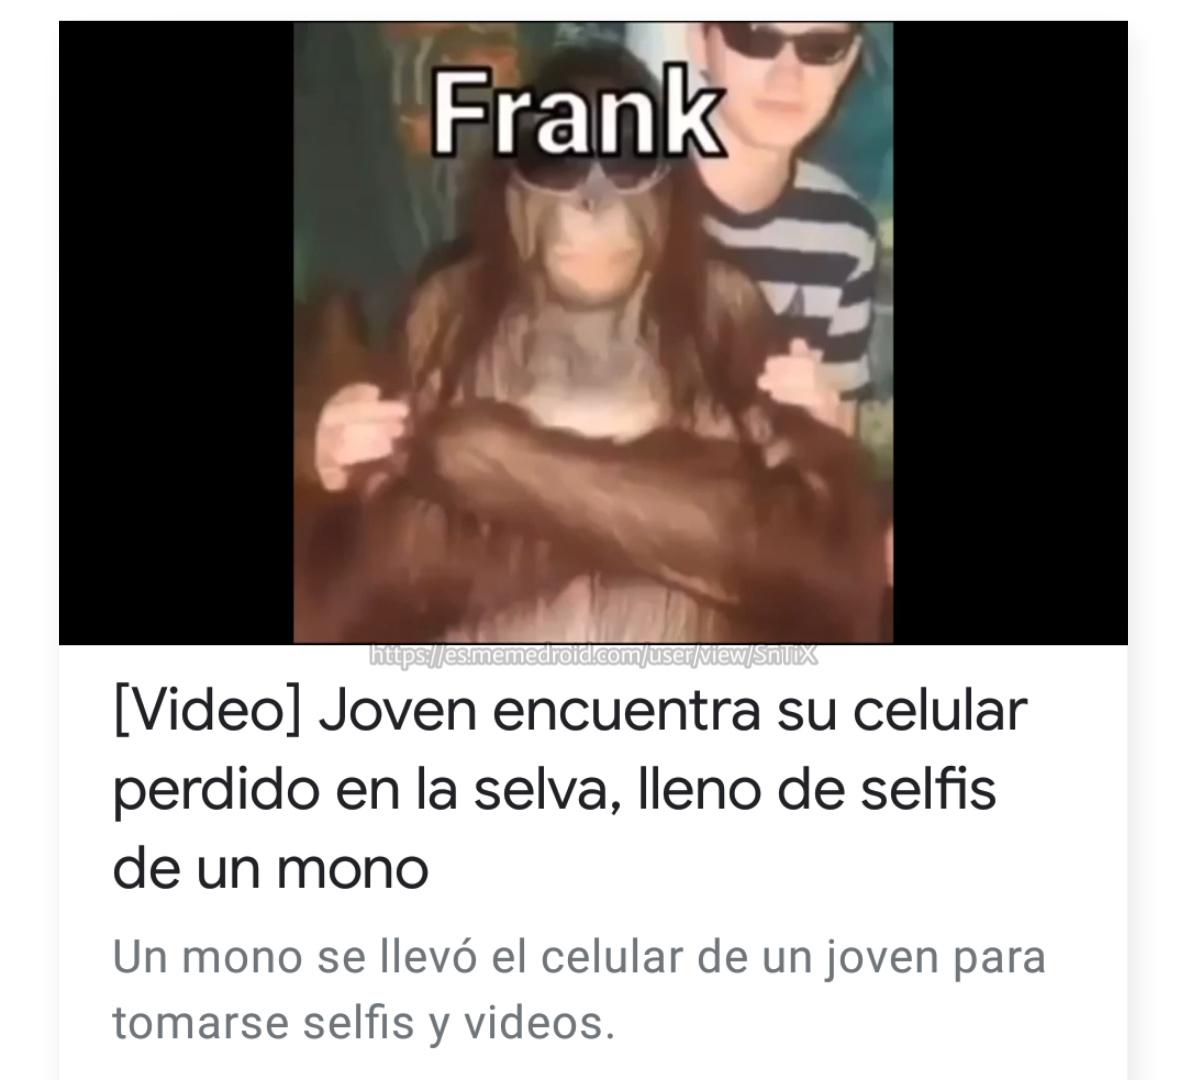 Joder Frank por qué tan guapo - meme